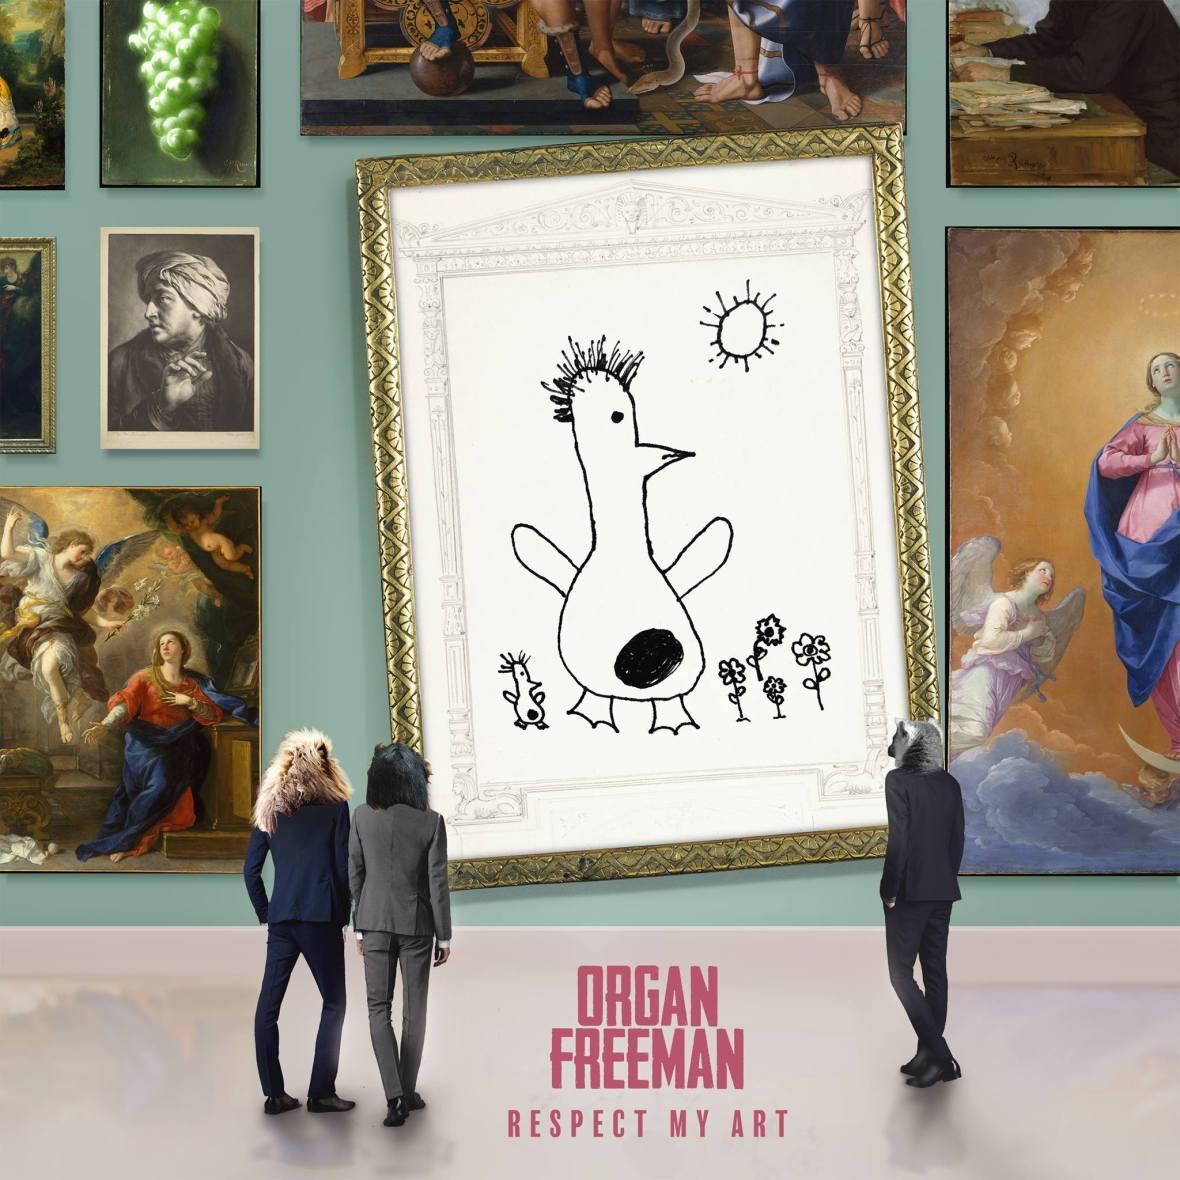 Summer Camp Series: Organ Freeman [INTERVIEW]